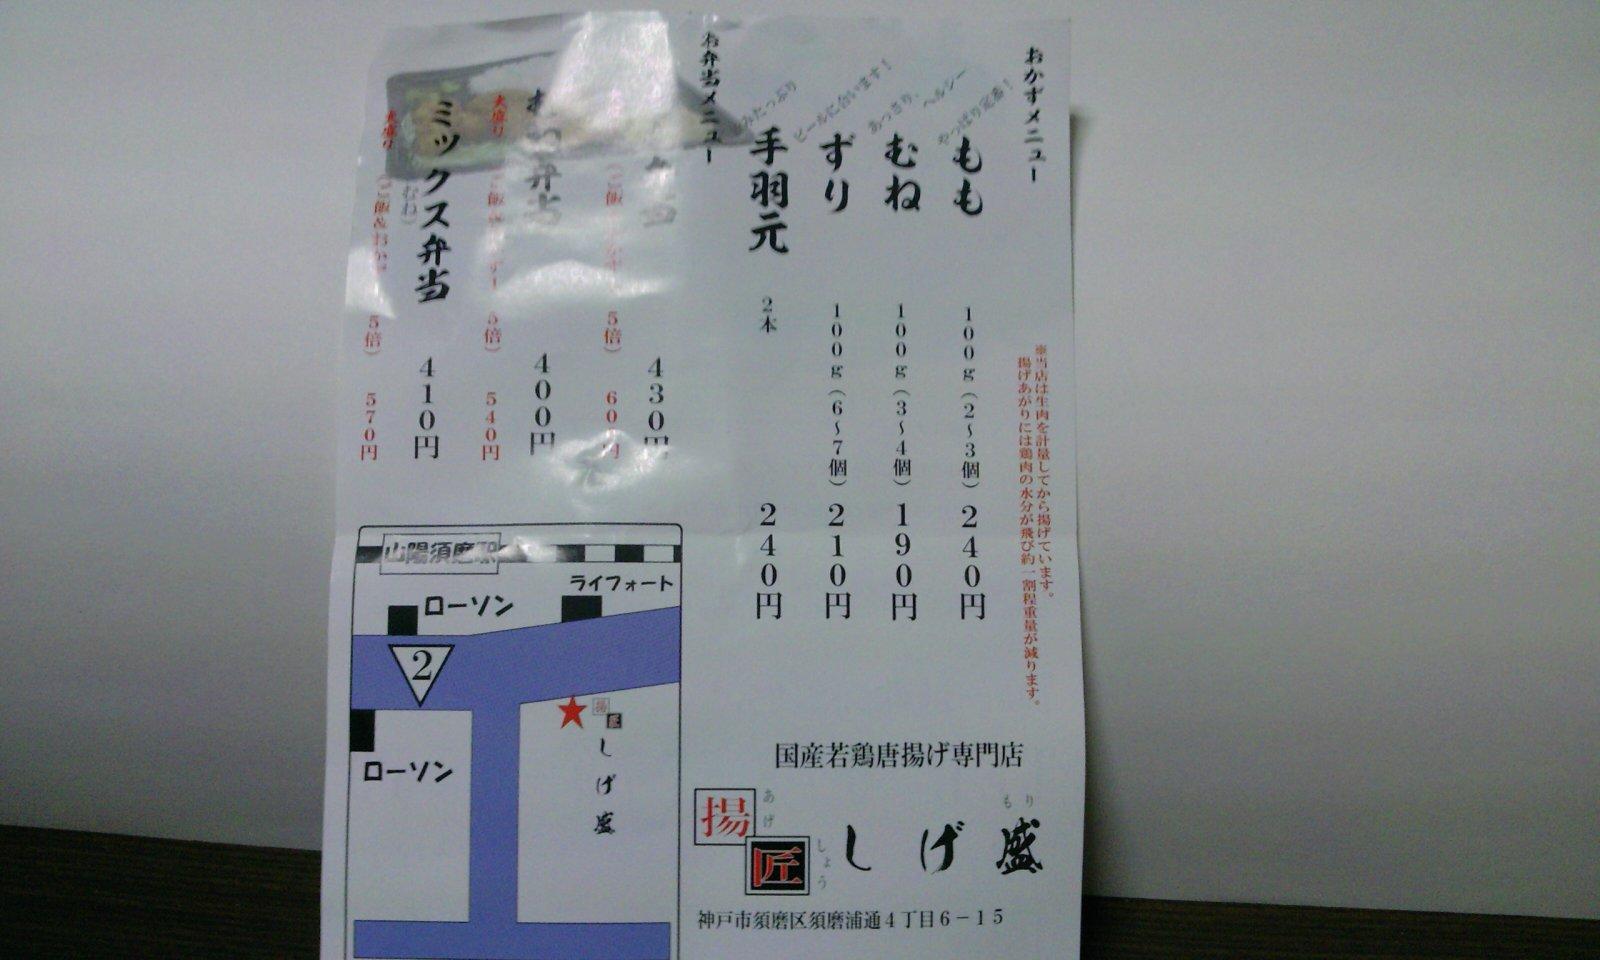 2011-11-02 14.42.15